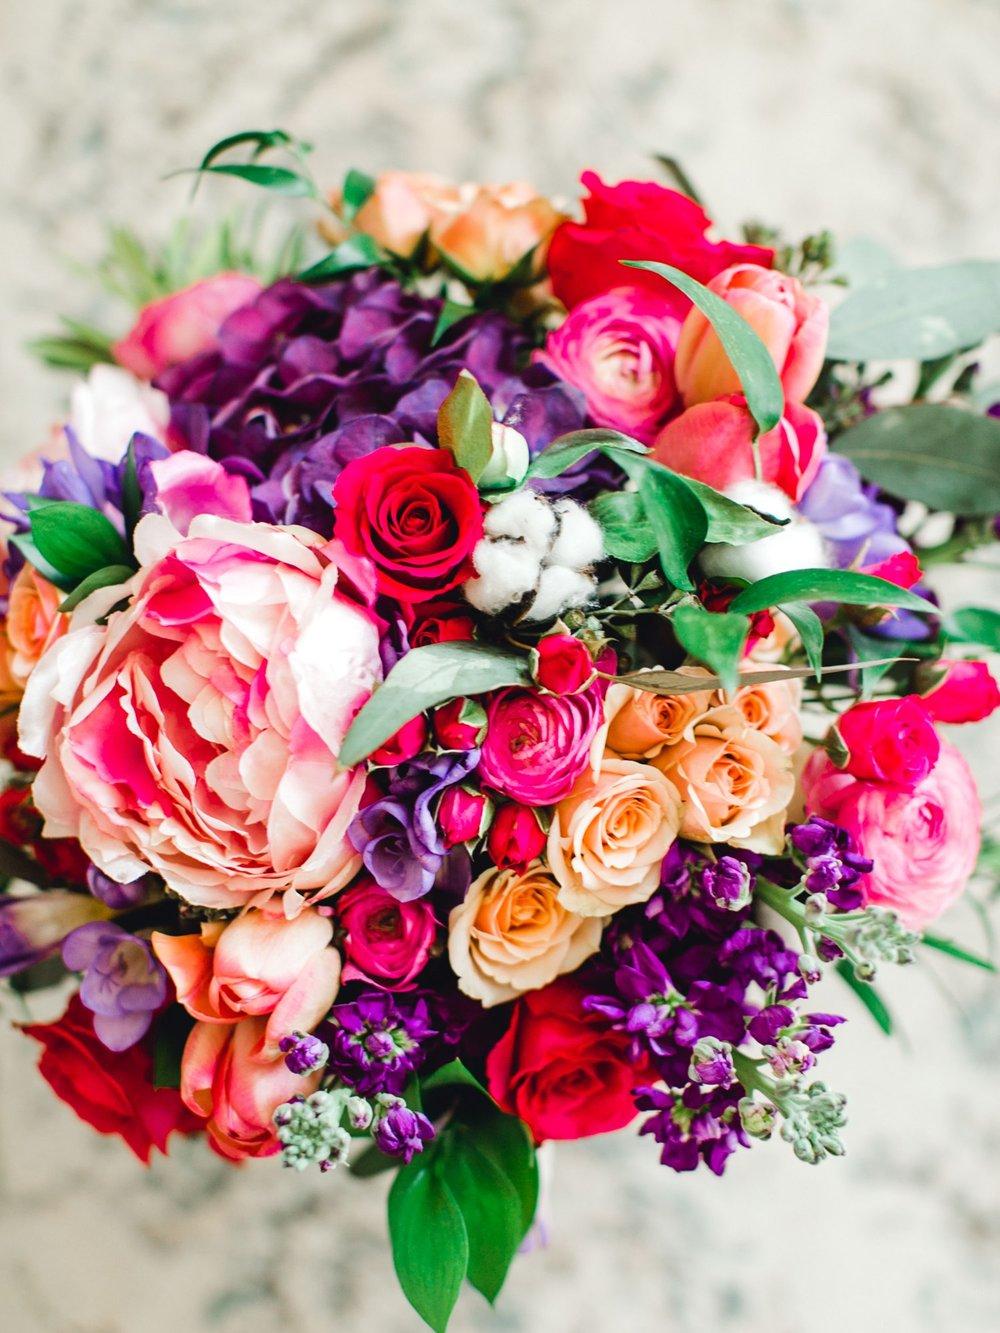 Jenna-and-garrett-Everett-kitalou-gin-lubbock-wedding-dayspring-designs-lubbock-wedding-photographer_0012.jpg